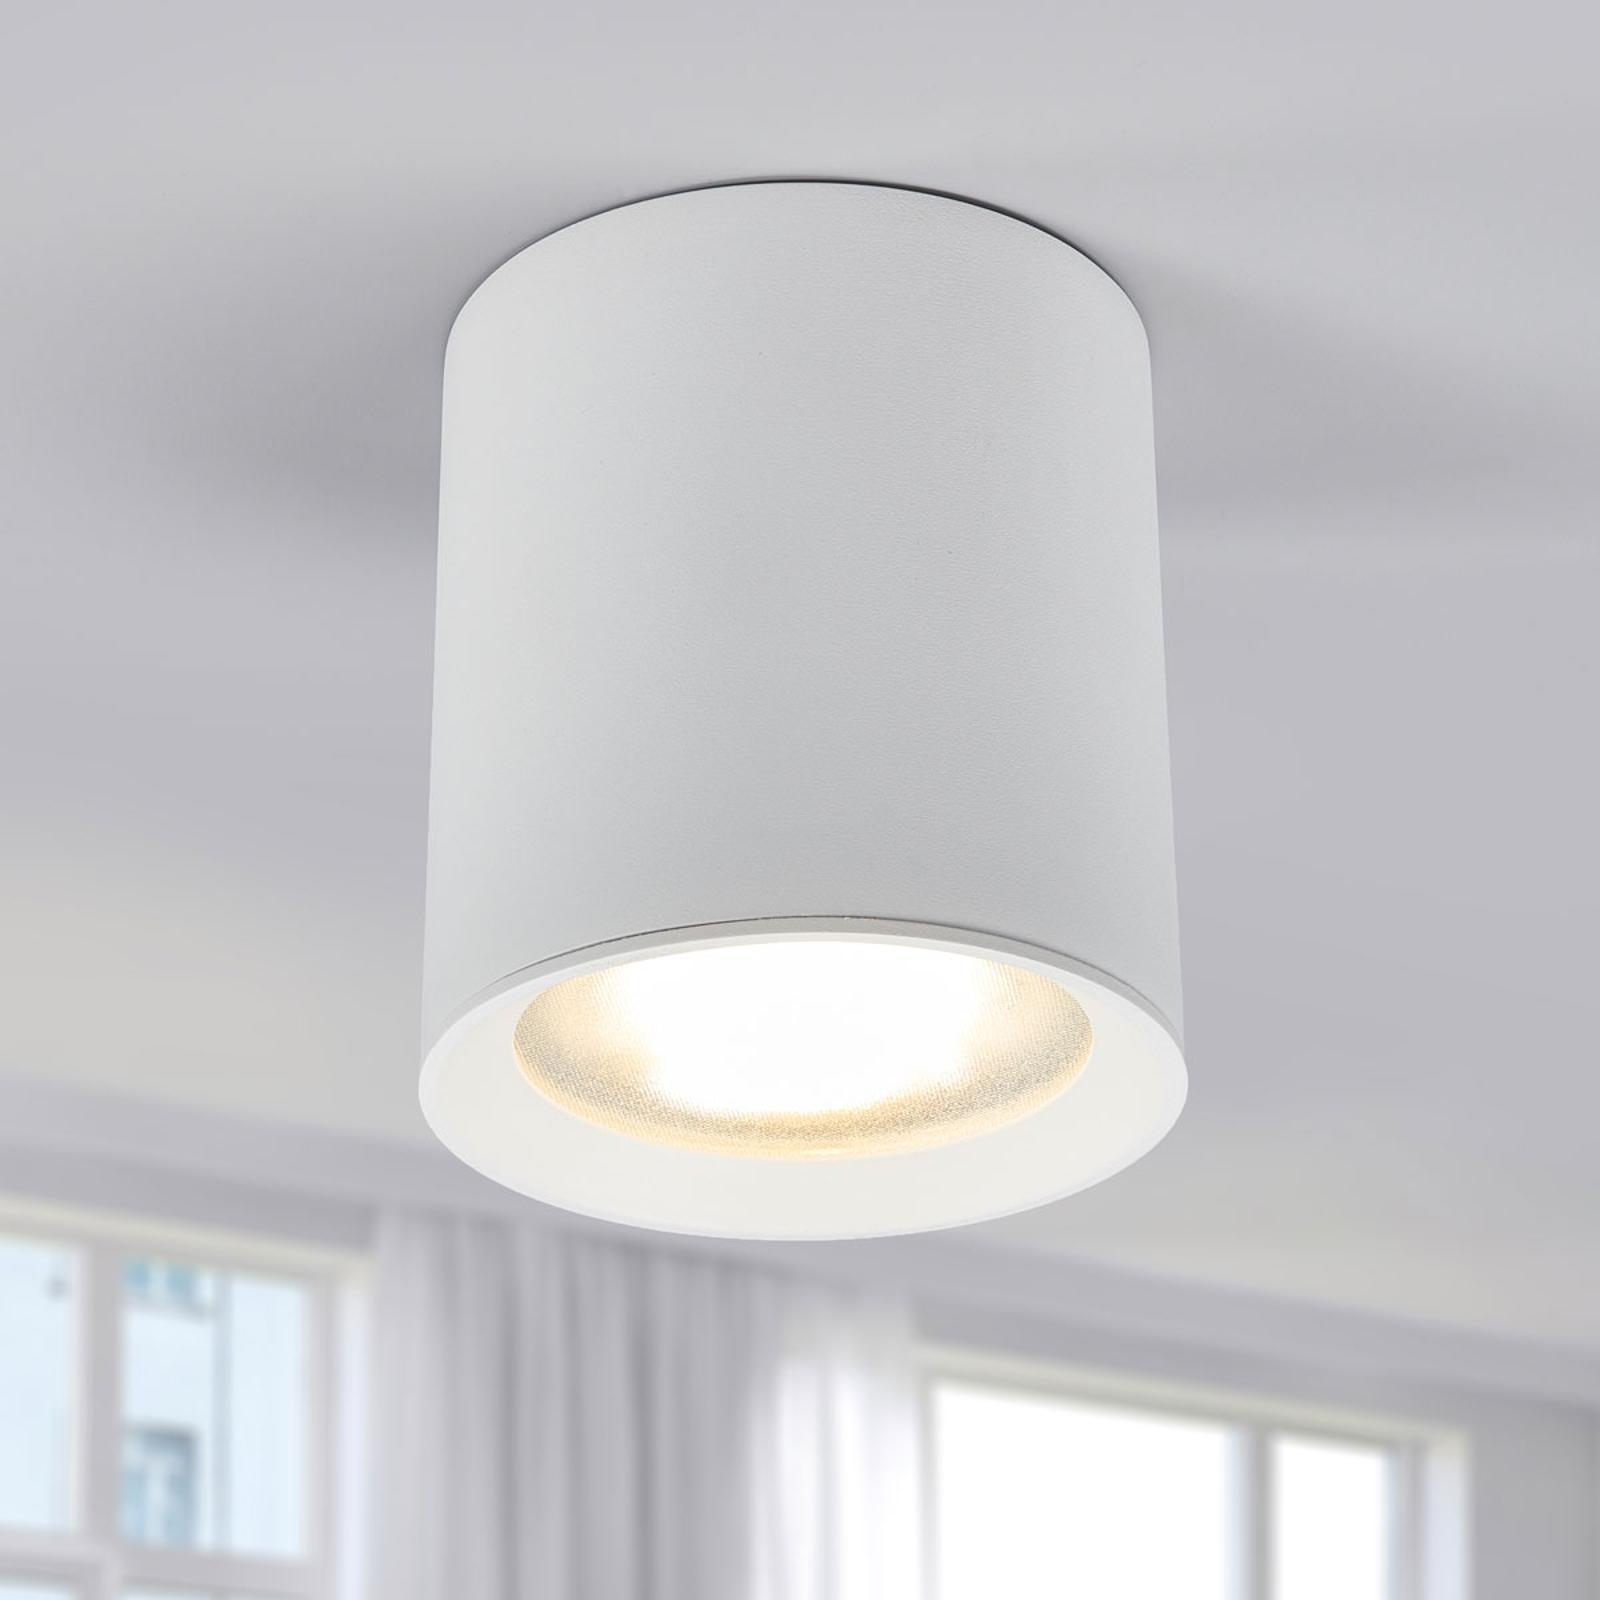 Lampa sufitowa LED Benk, 11 cm, 6,7 W